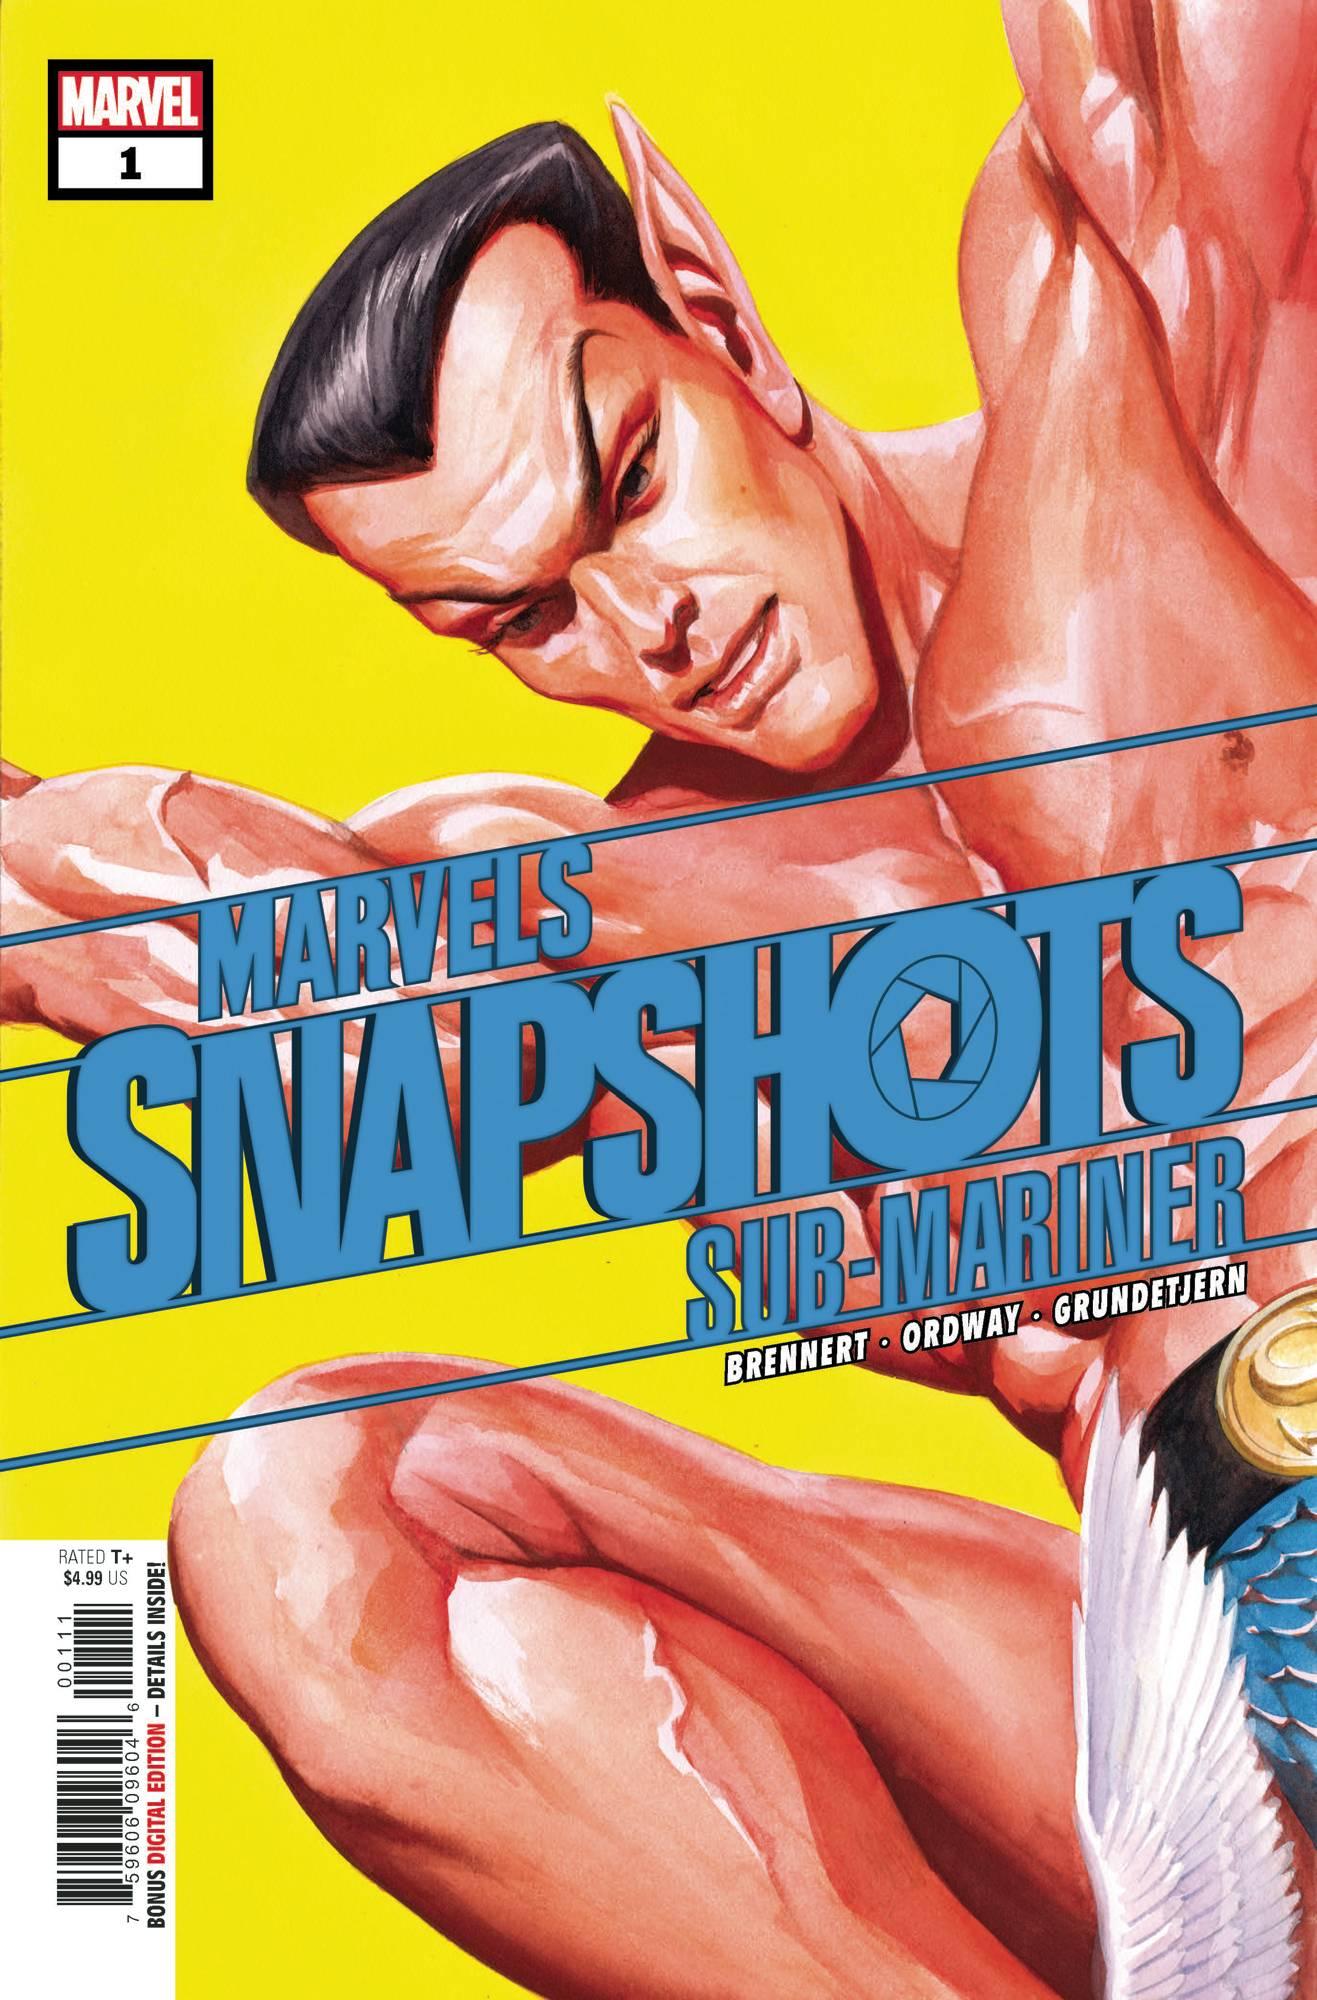 Marvel's Snapshot Sub-Mariner #1